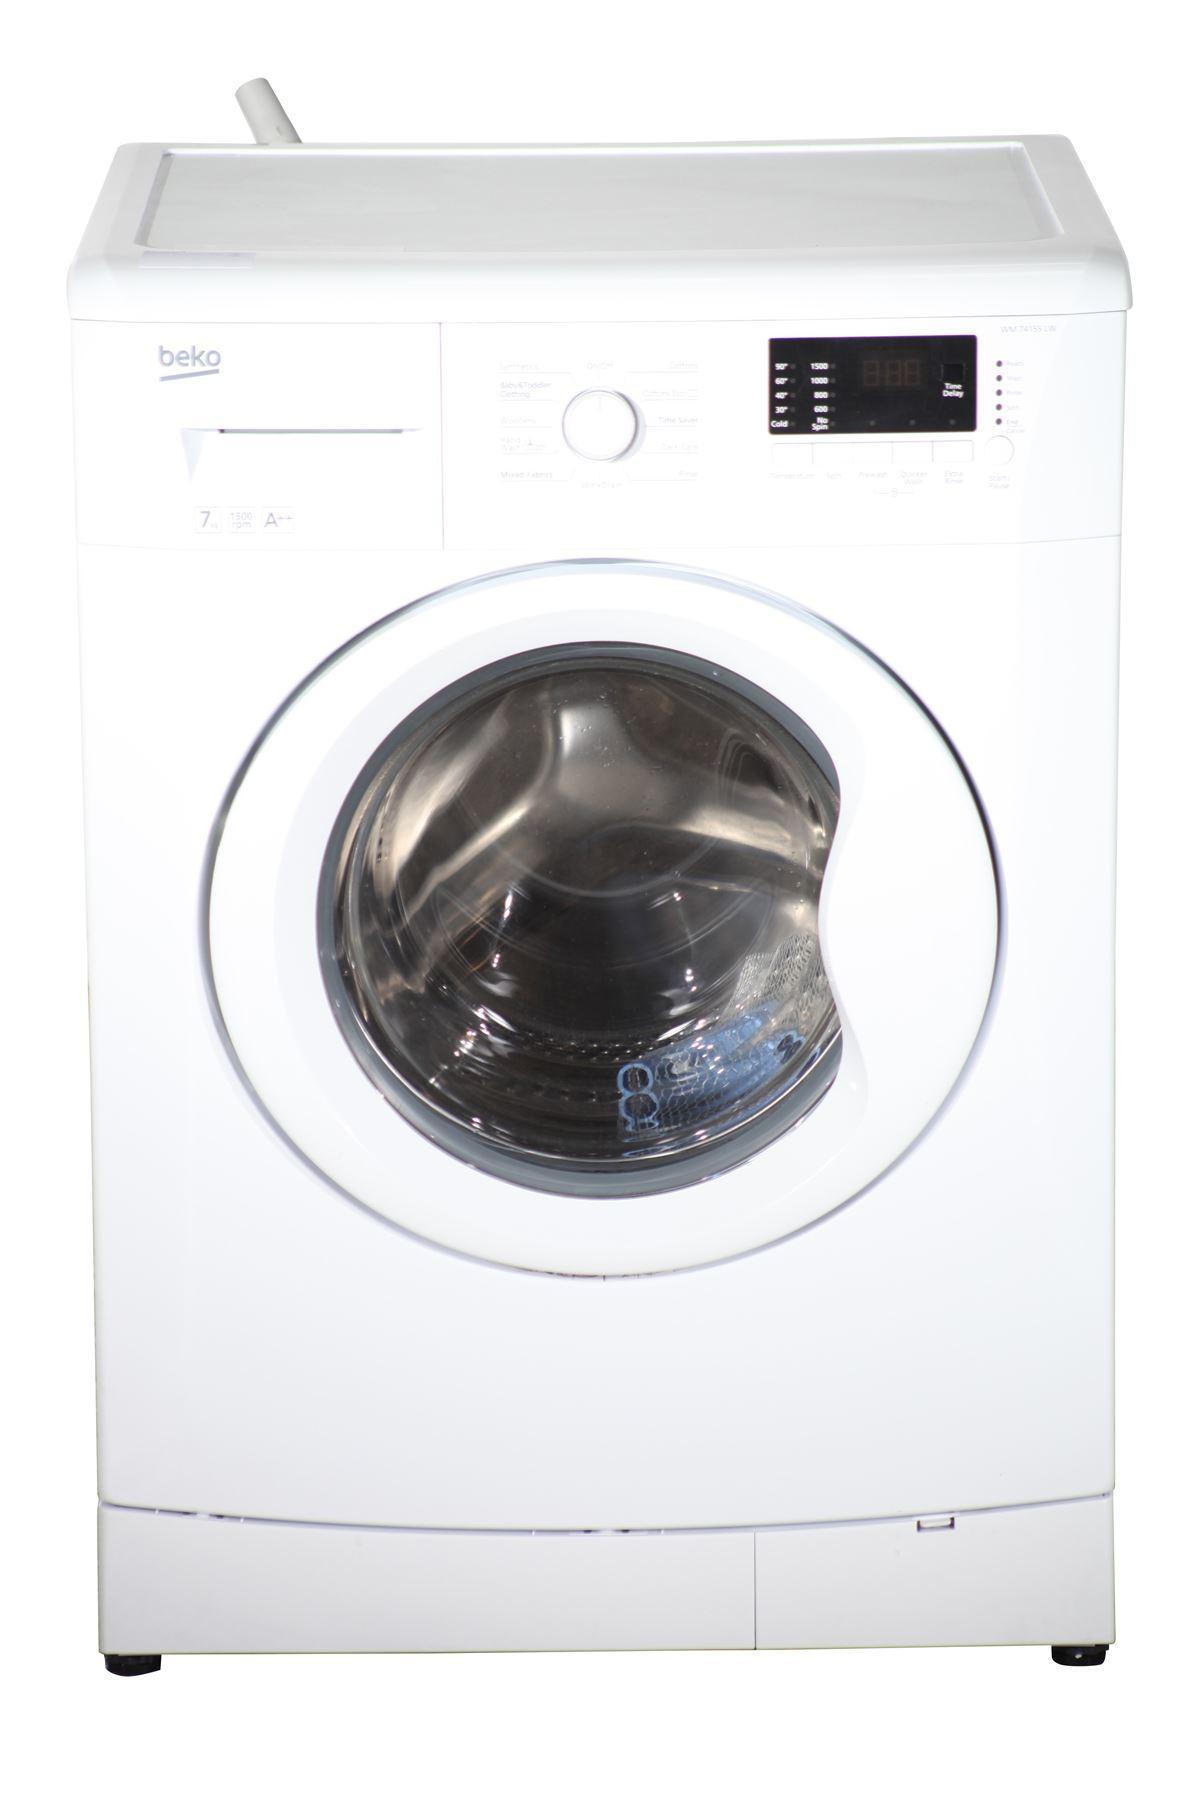 beko 7kg washing machine wm74155lw white online store. Black Bedroom Furniture Sets. Home Design Ideas